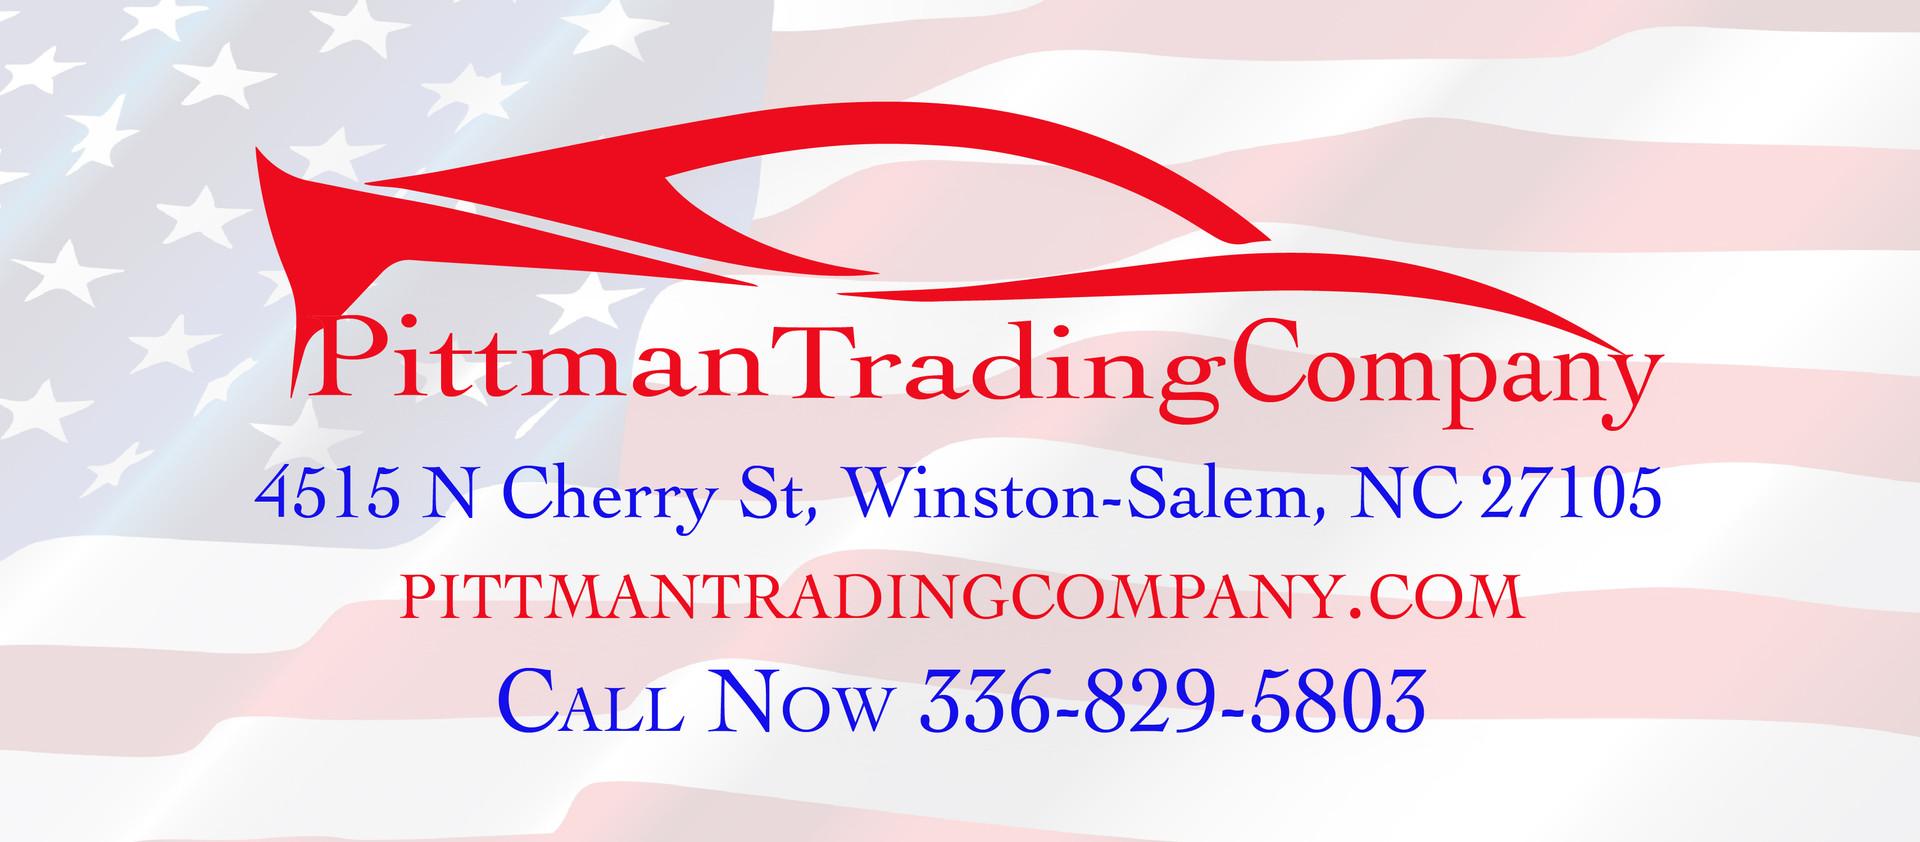 Pittman Trading Company